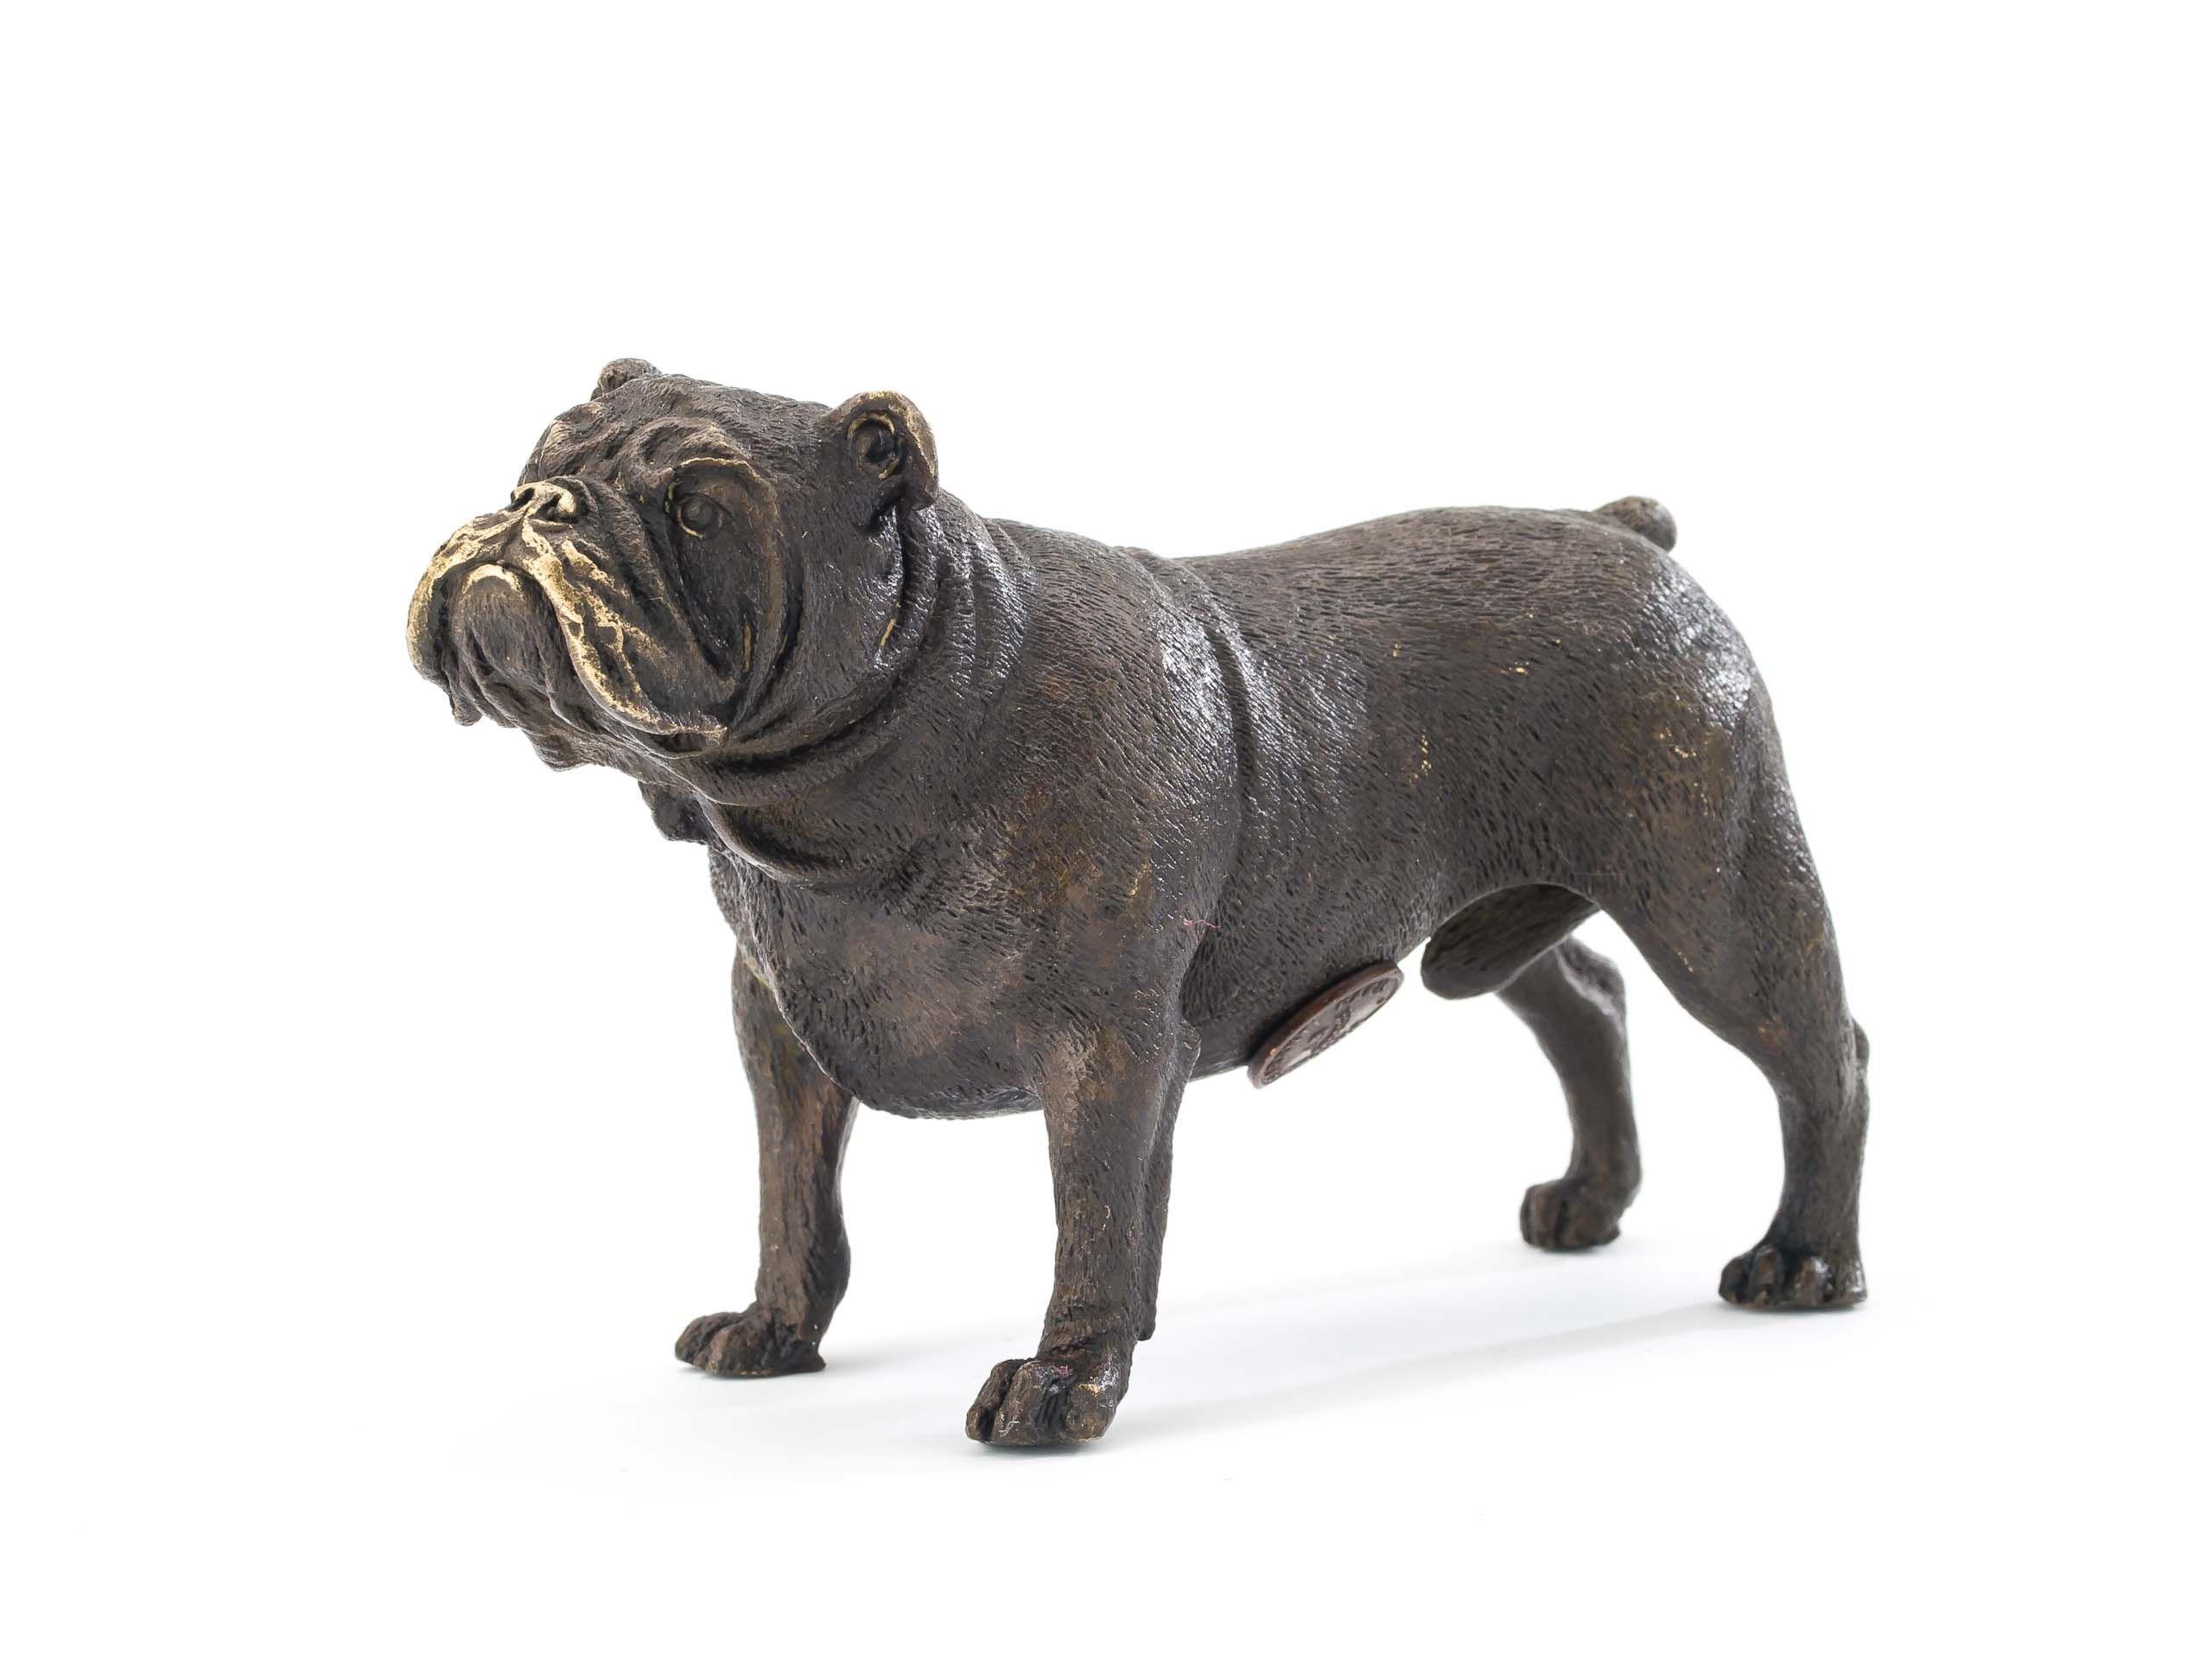 Bronzefigur Bulldogge Hund Dogge Skulptur Bronze Bronzeskulptur antik Stil